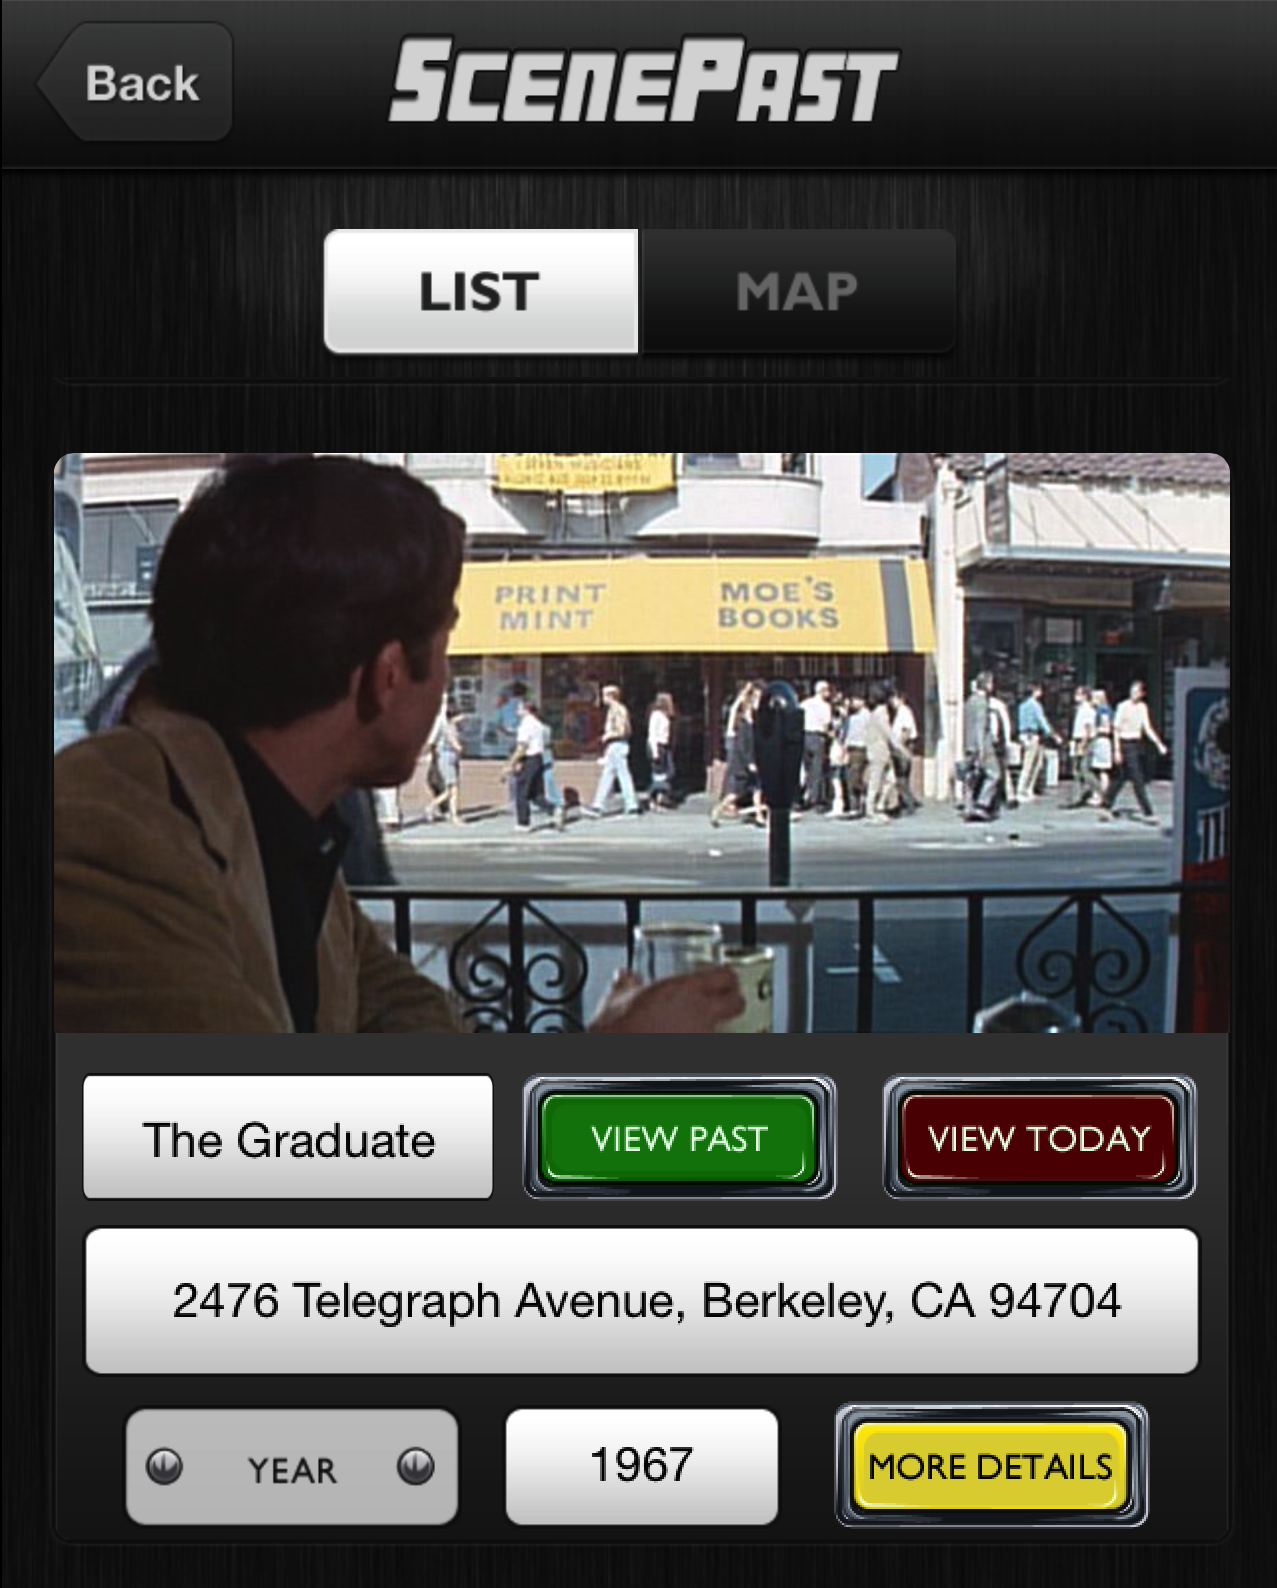 The Graduate, Then